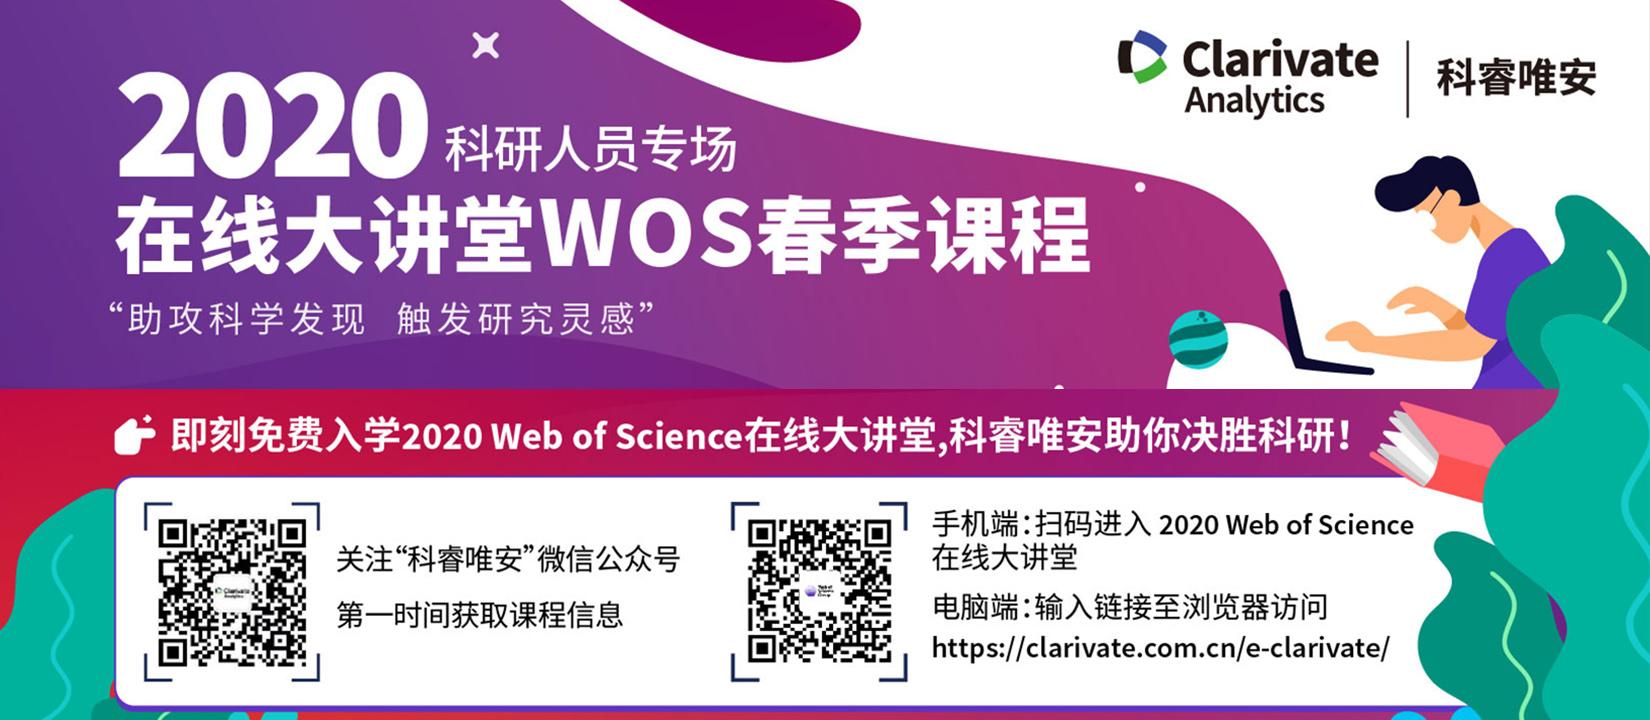 Web of Science 在線大講堂春季課程(2020年科研人員專場)